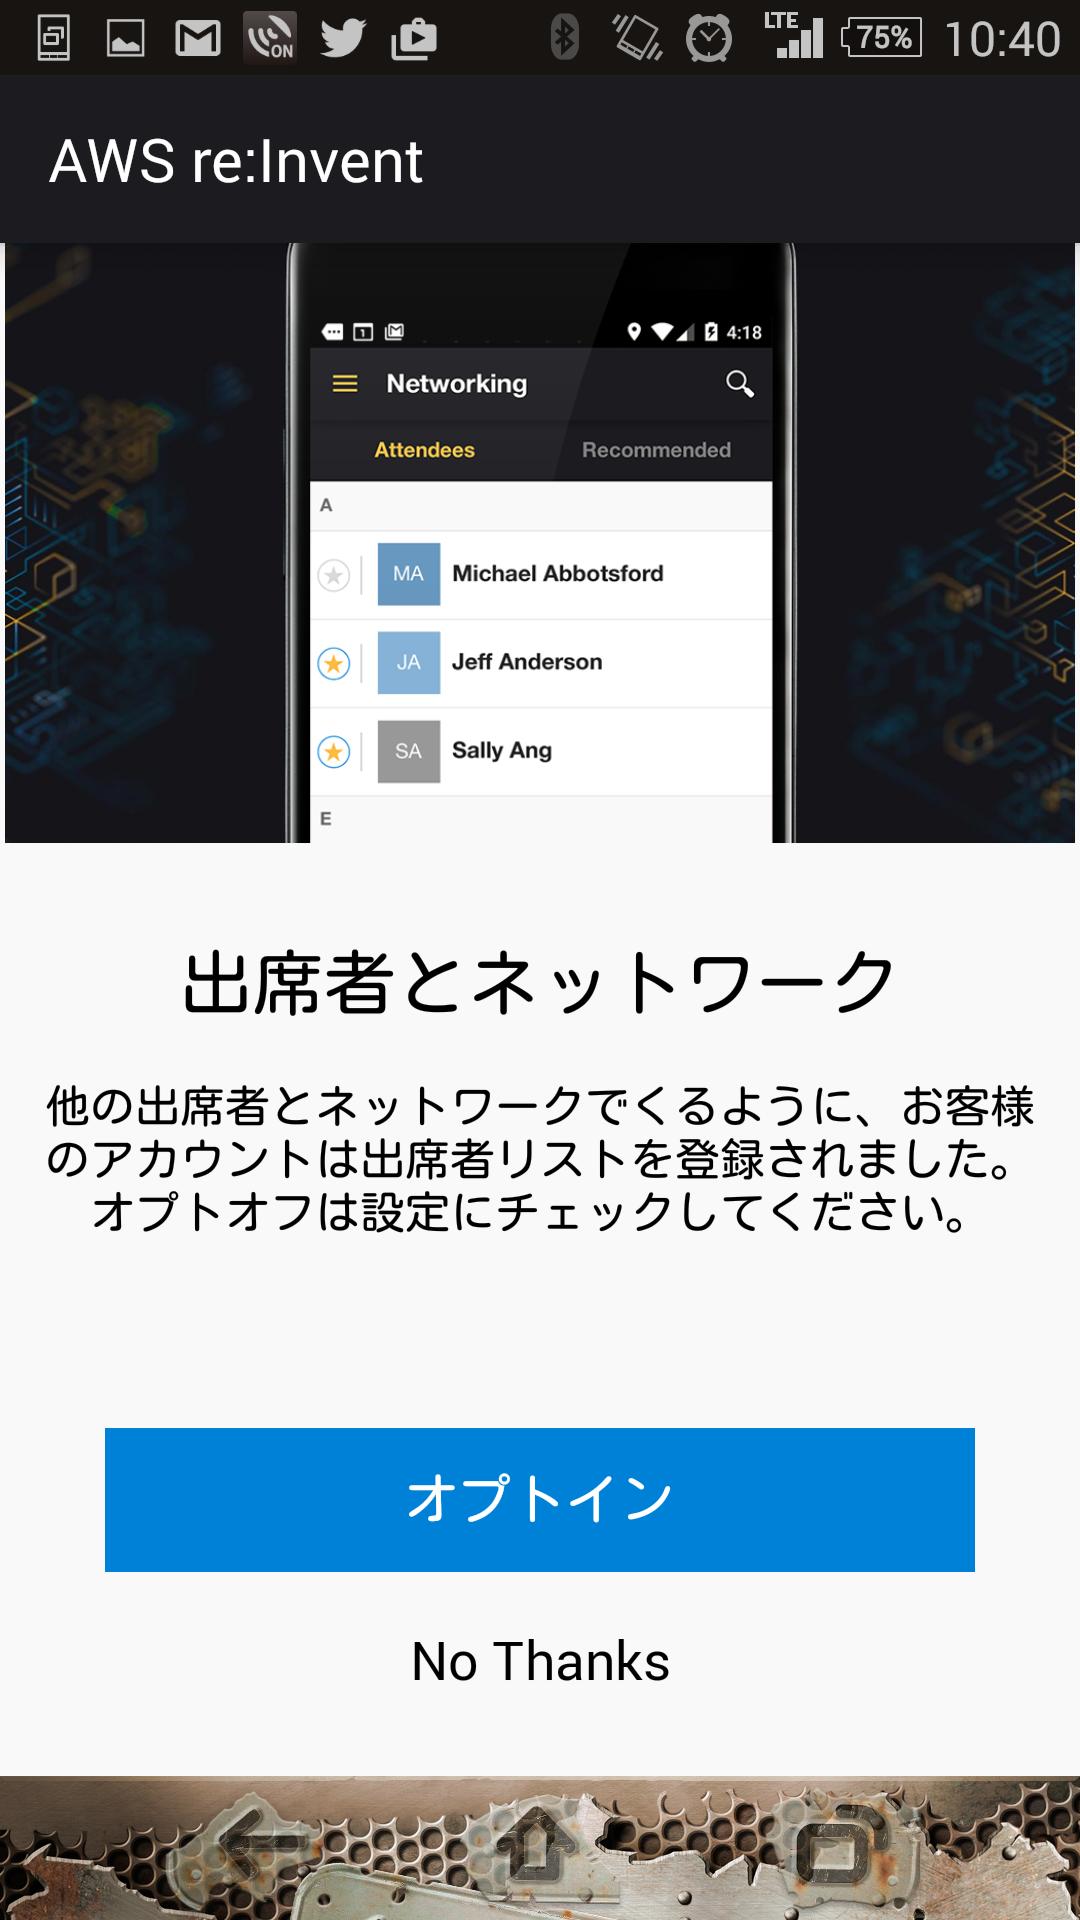 aws-reinvent-2015-event-app_04